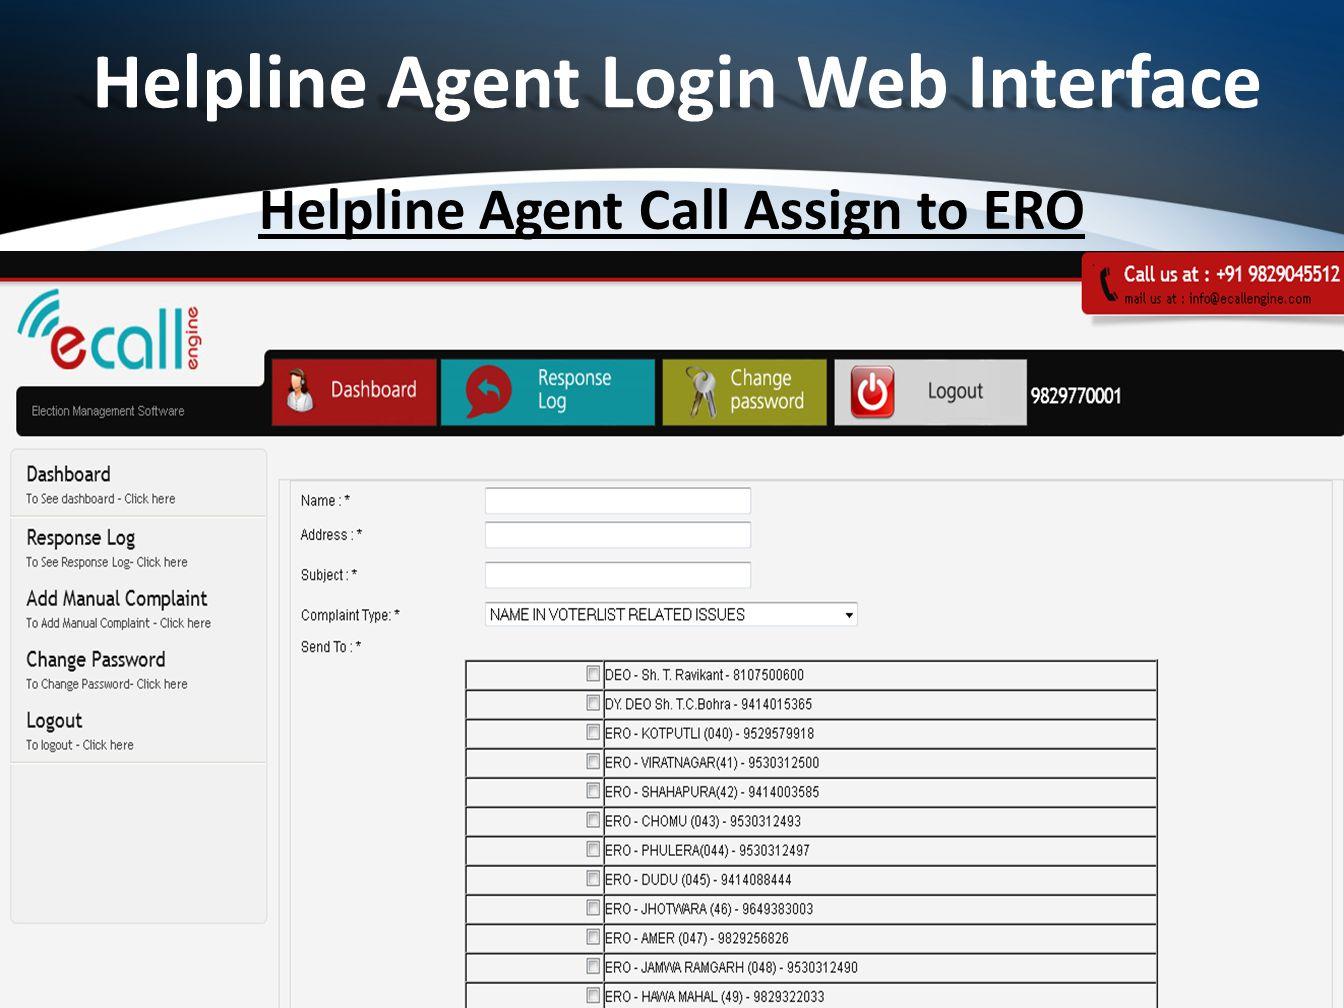 Helpline Agent Call Assign to ERO Helpline Agent Login Web Interface